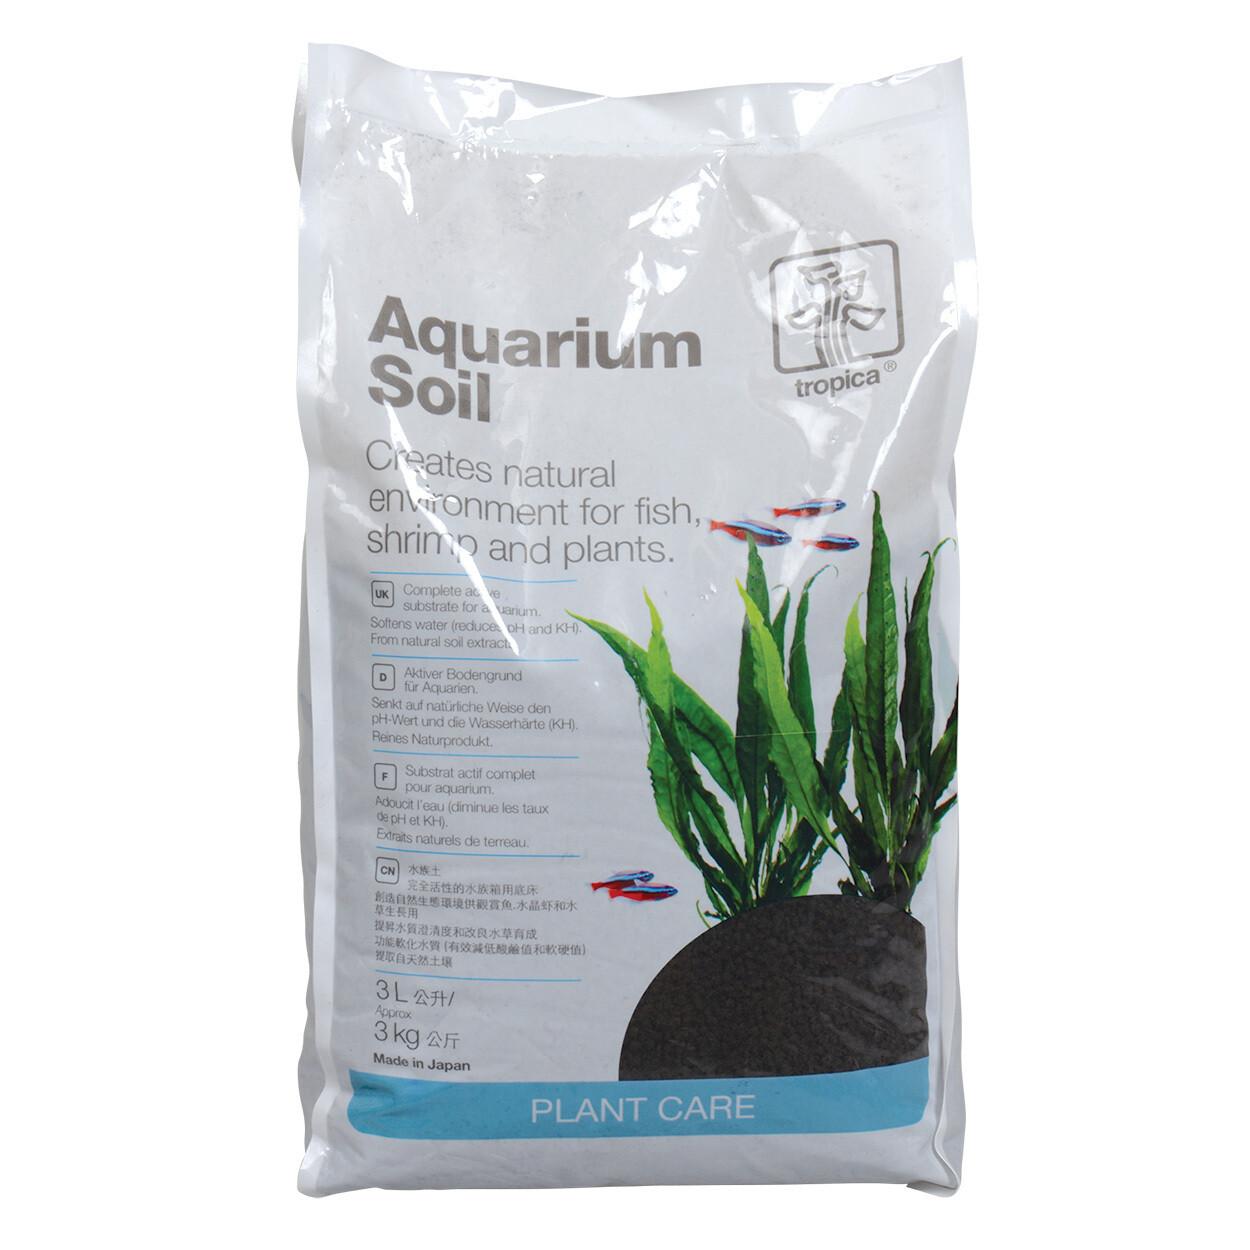 Troipca Aquarium Soil 3L